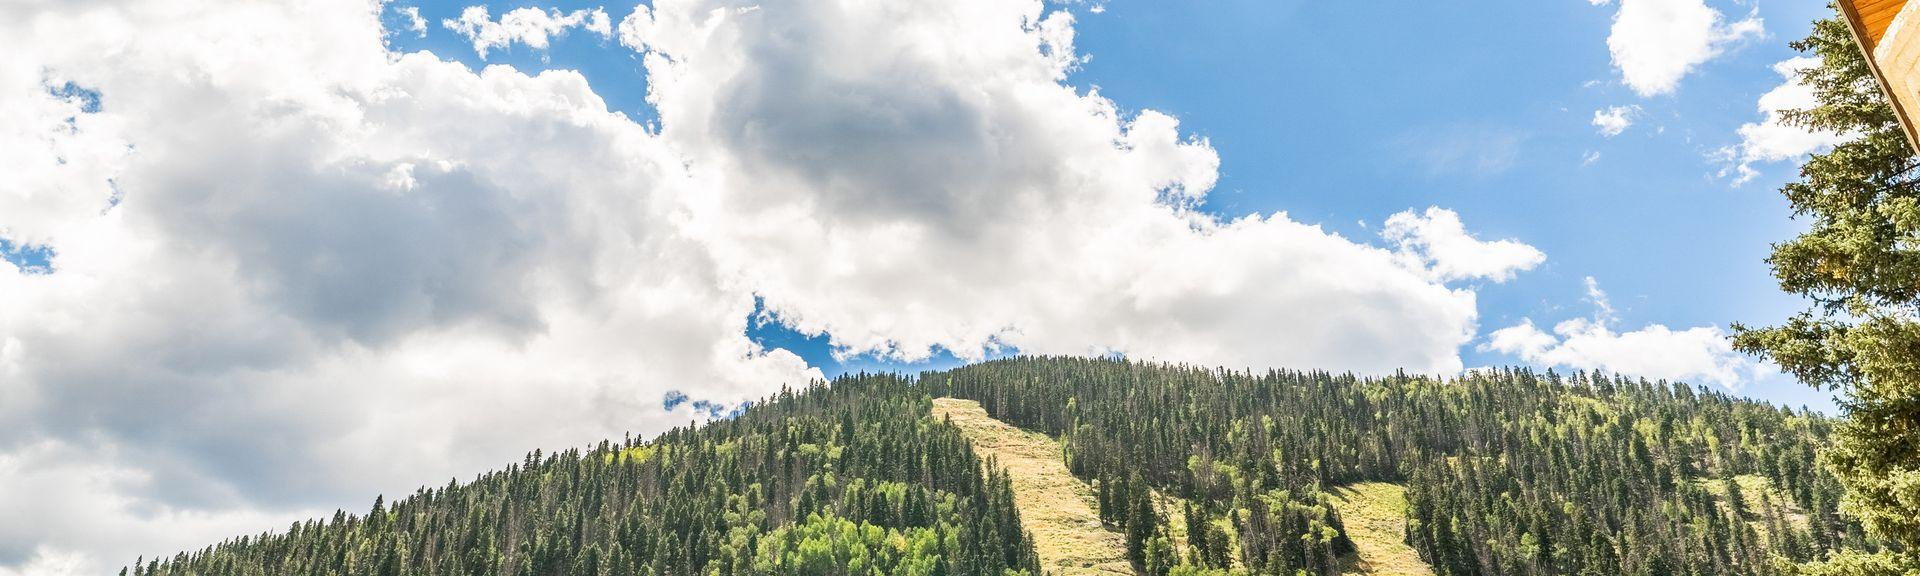 Kit Carson Park, Taos, NM, USA